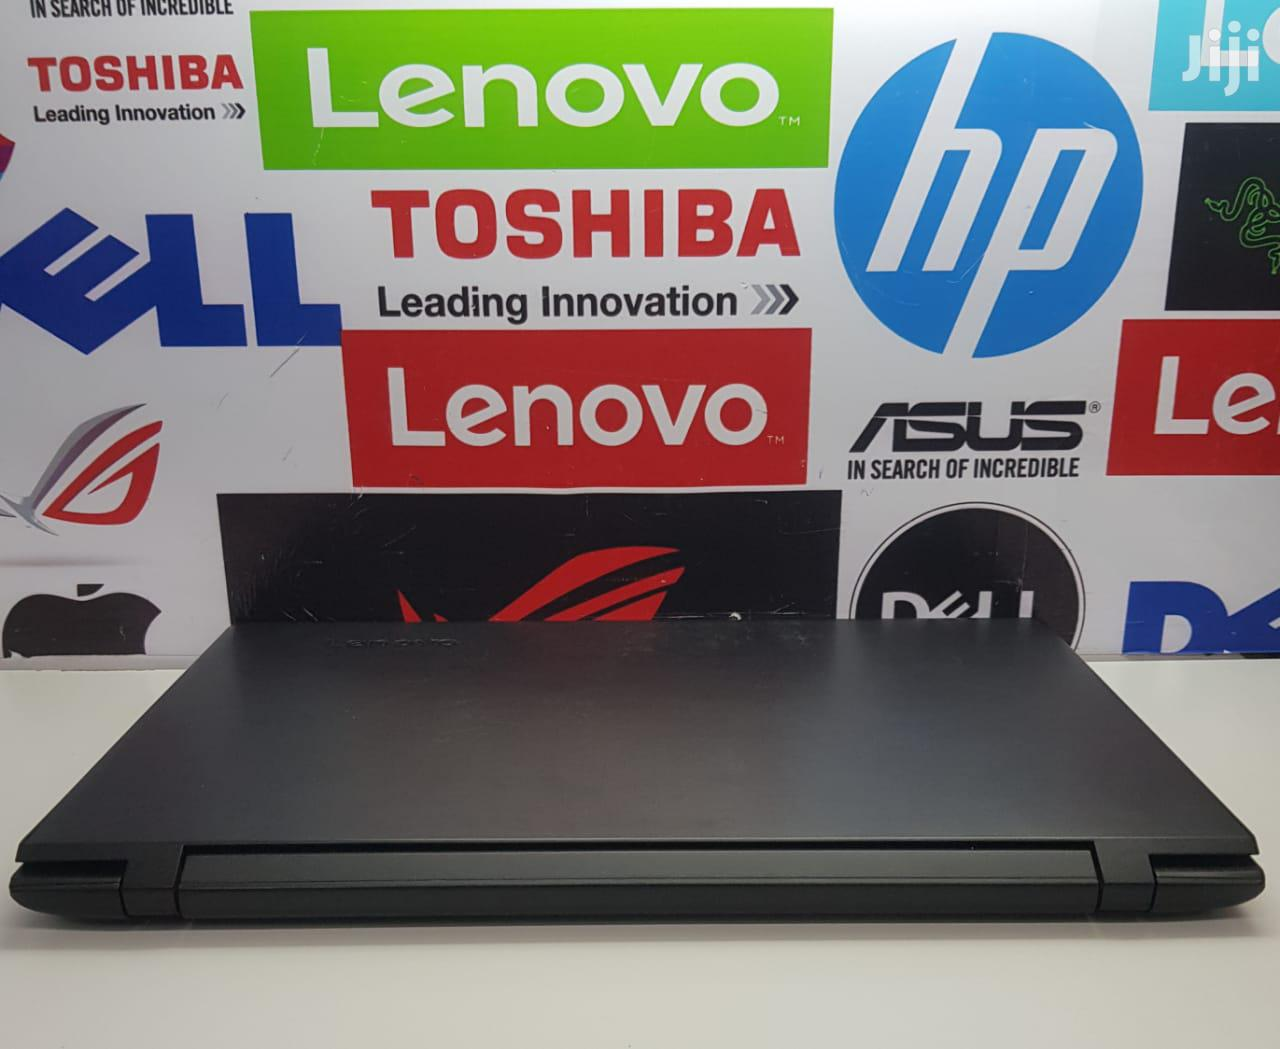 Laptop Lenovo IdeaPad 110 8GB Intel Core i5 HDD 1T